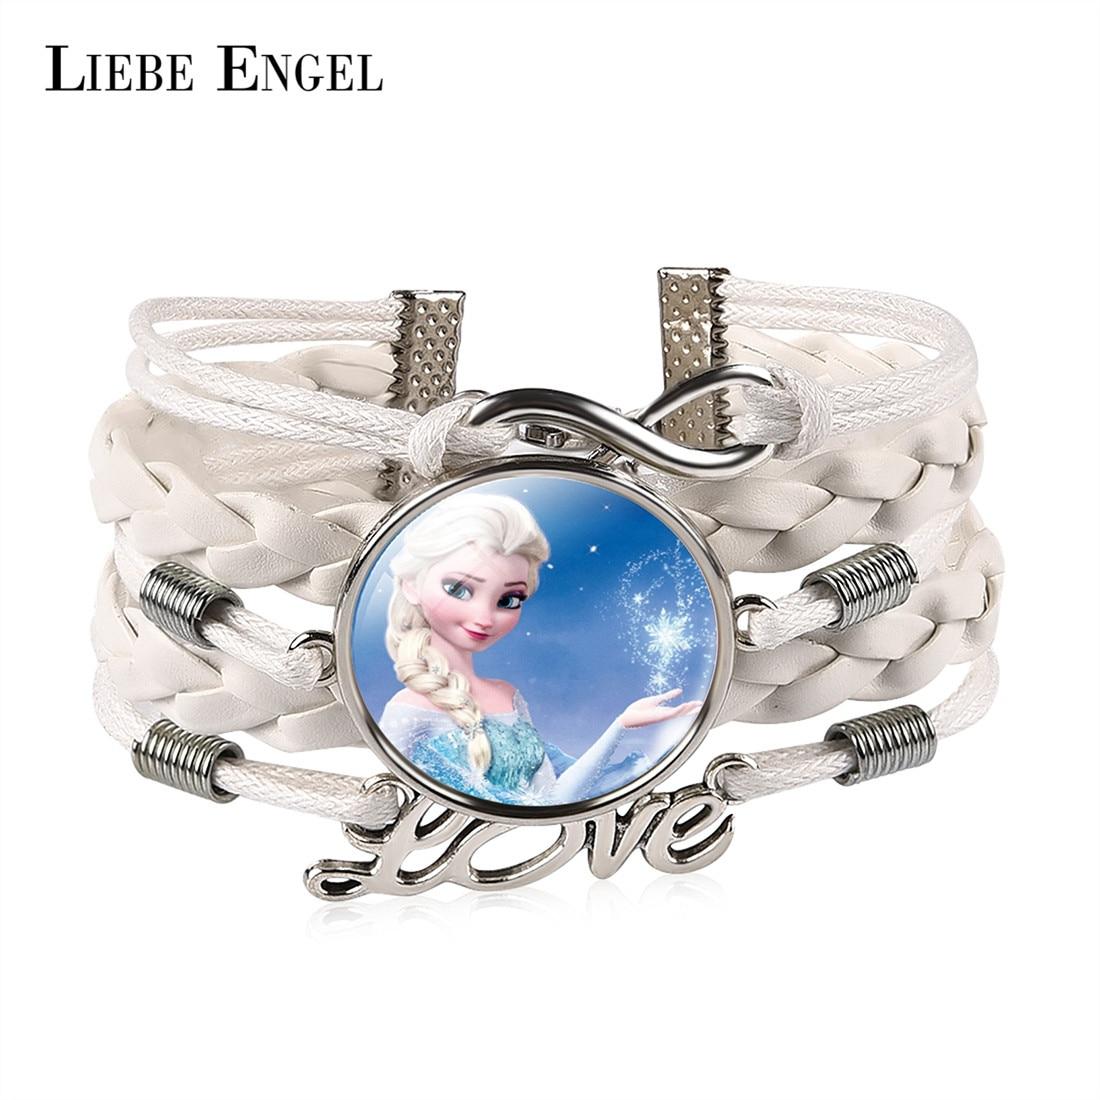 LIEBE ENGEL Charm Jewelry White Leather Bracelet Anime Elsa Anna Princess Pattern Glass Infinity Love Bangle For Women Gift